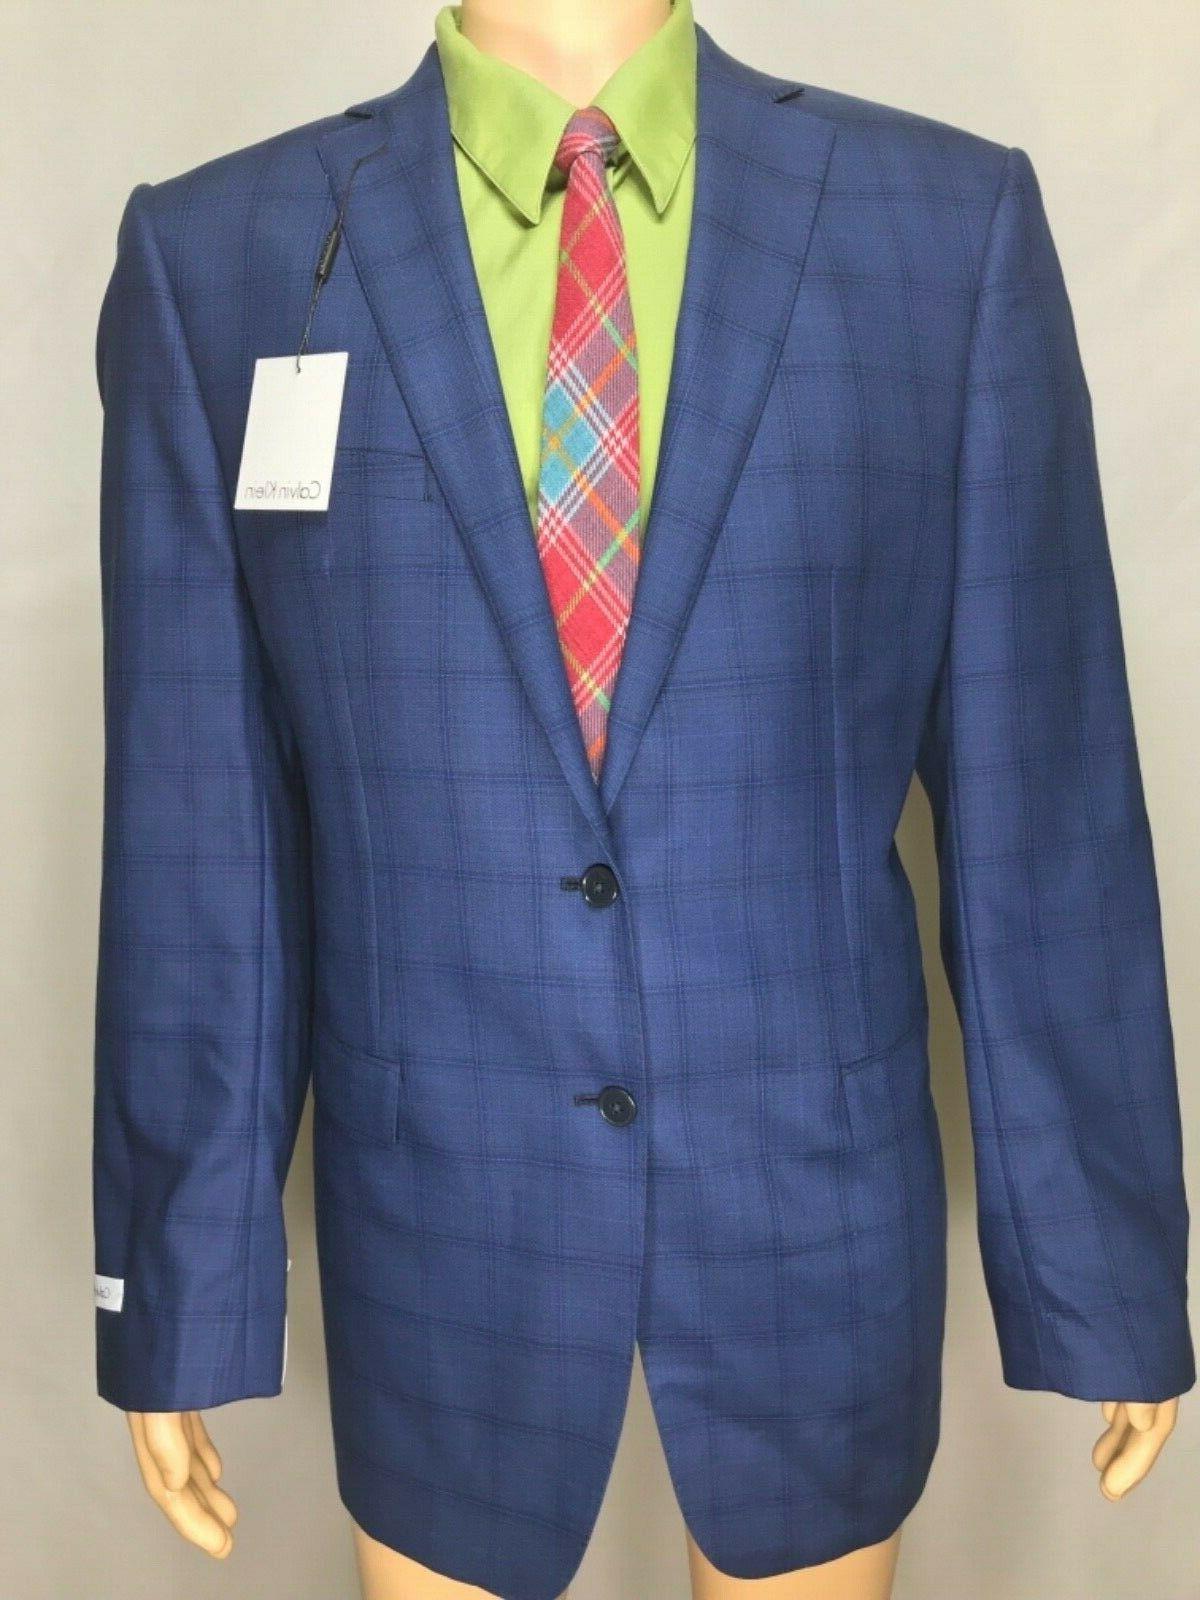 3225 nwt mens 44 long suit jacket